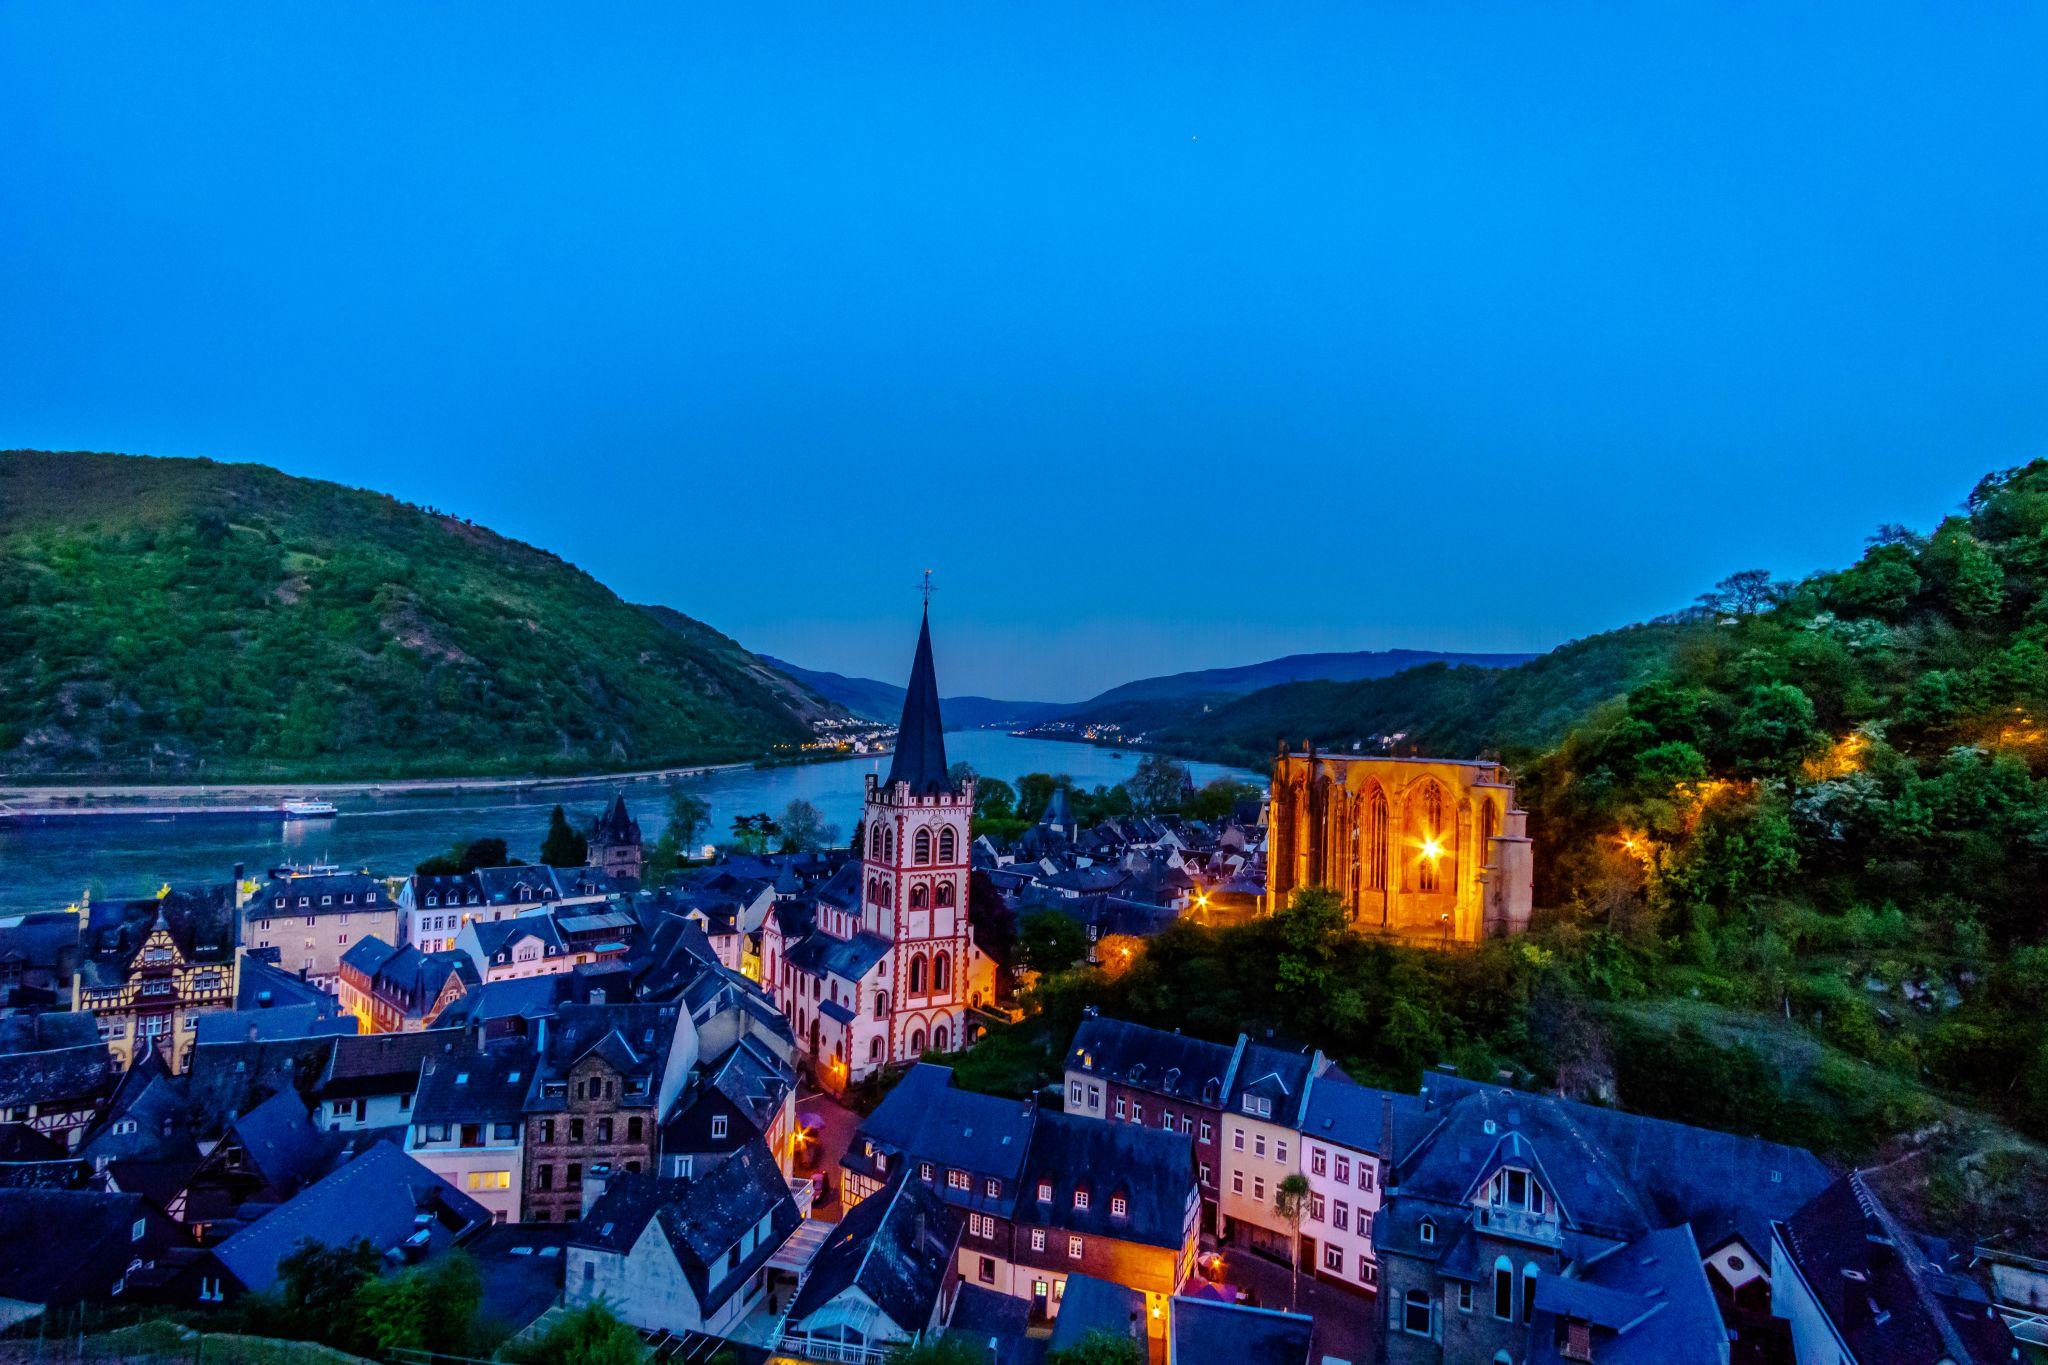 Bacharach and the Rhine, Germany